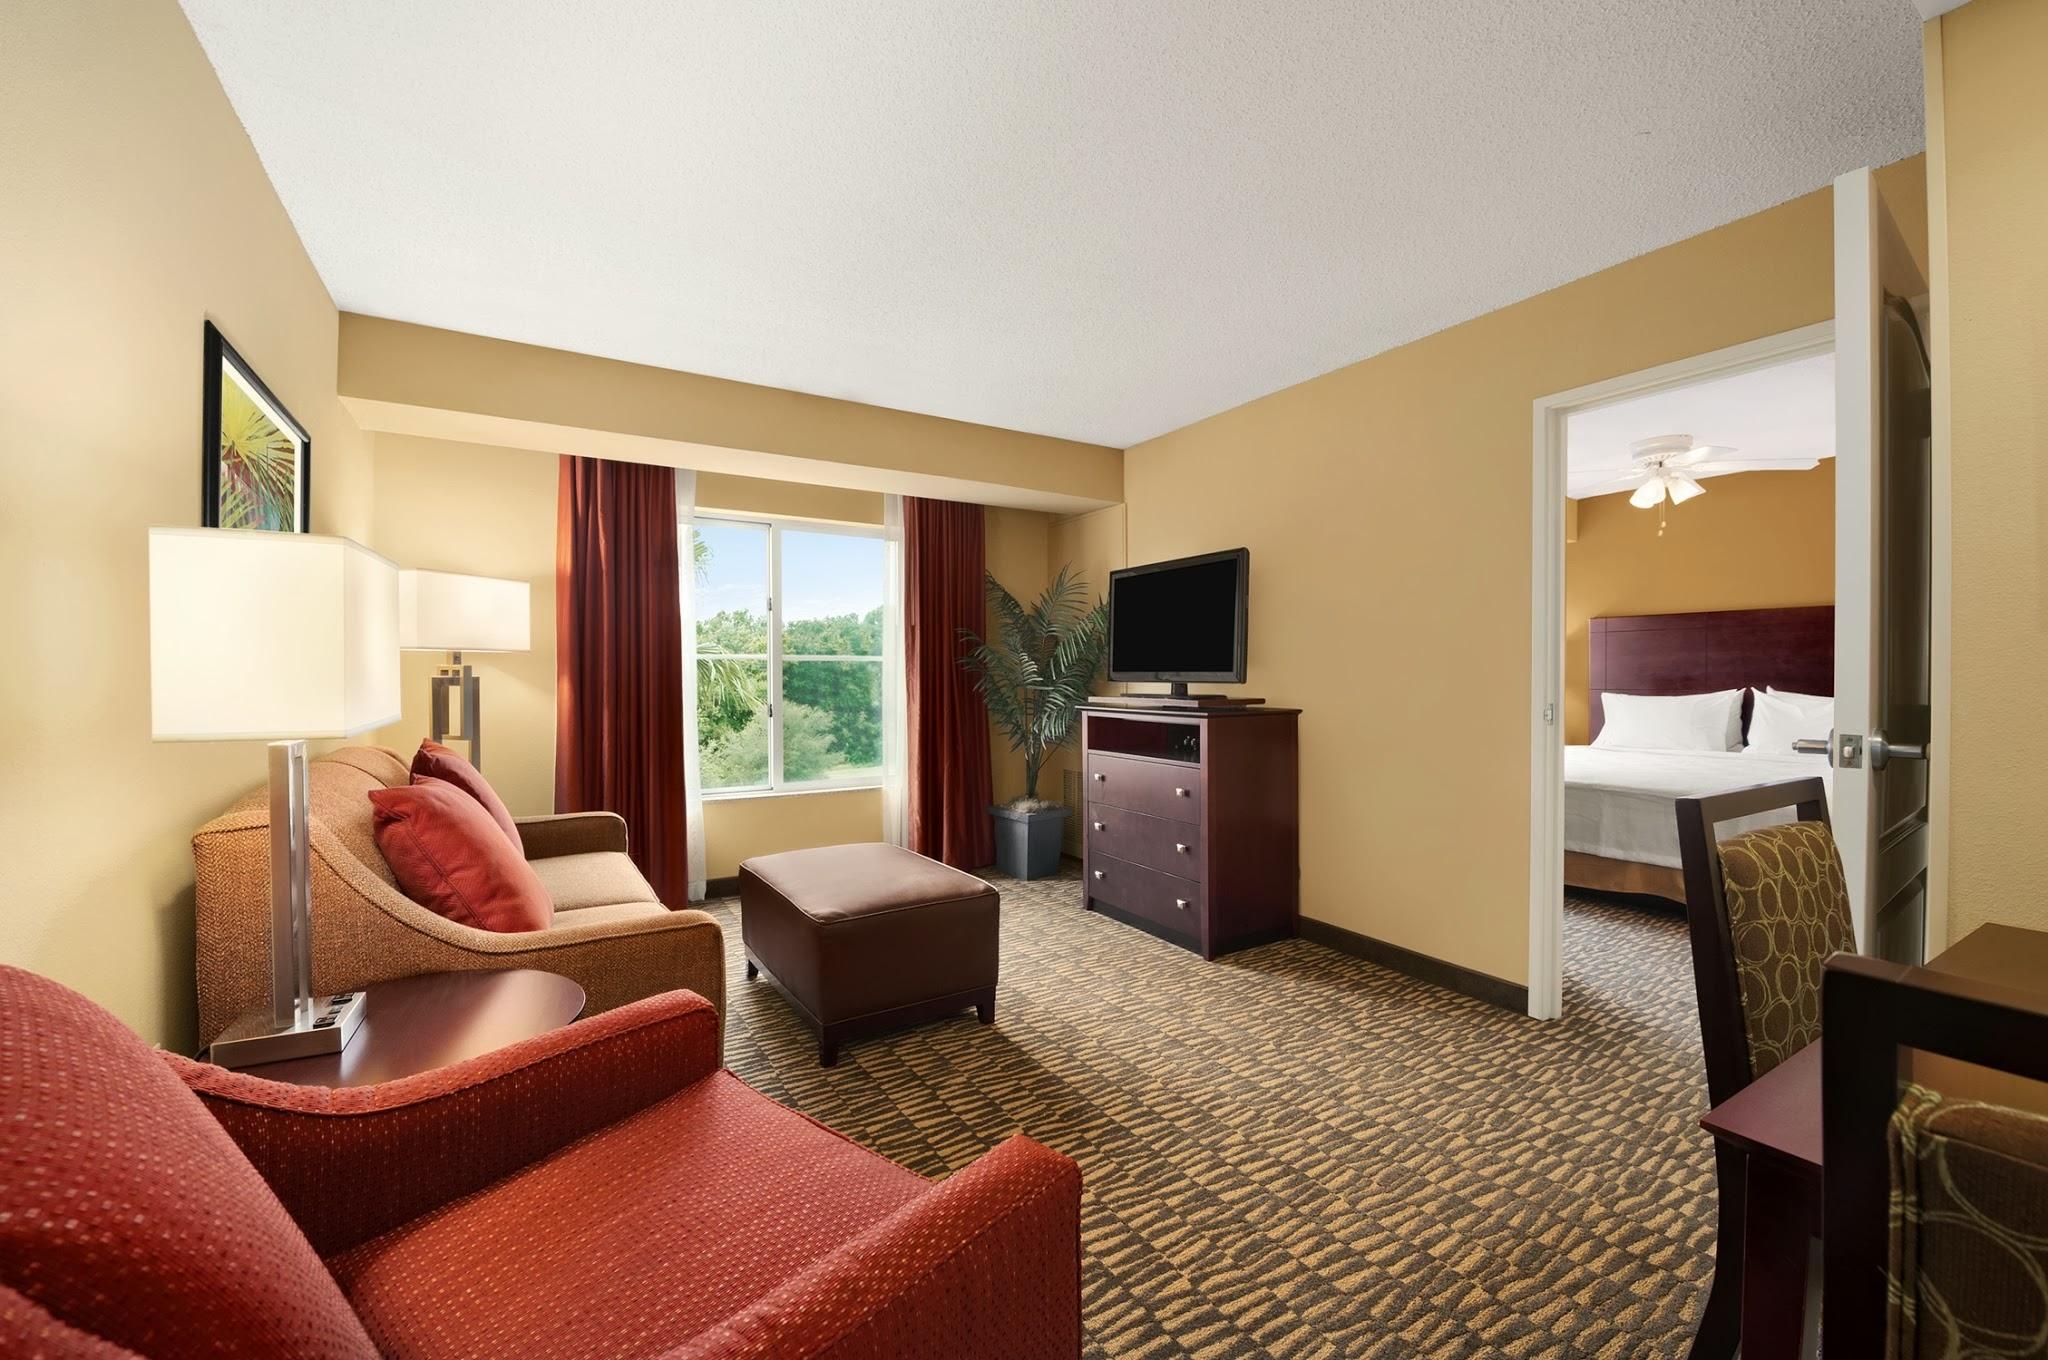 Homewood Suites by Hilton Tampa-Brandon, Tampa FL